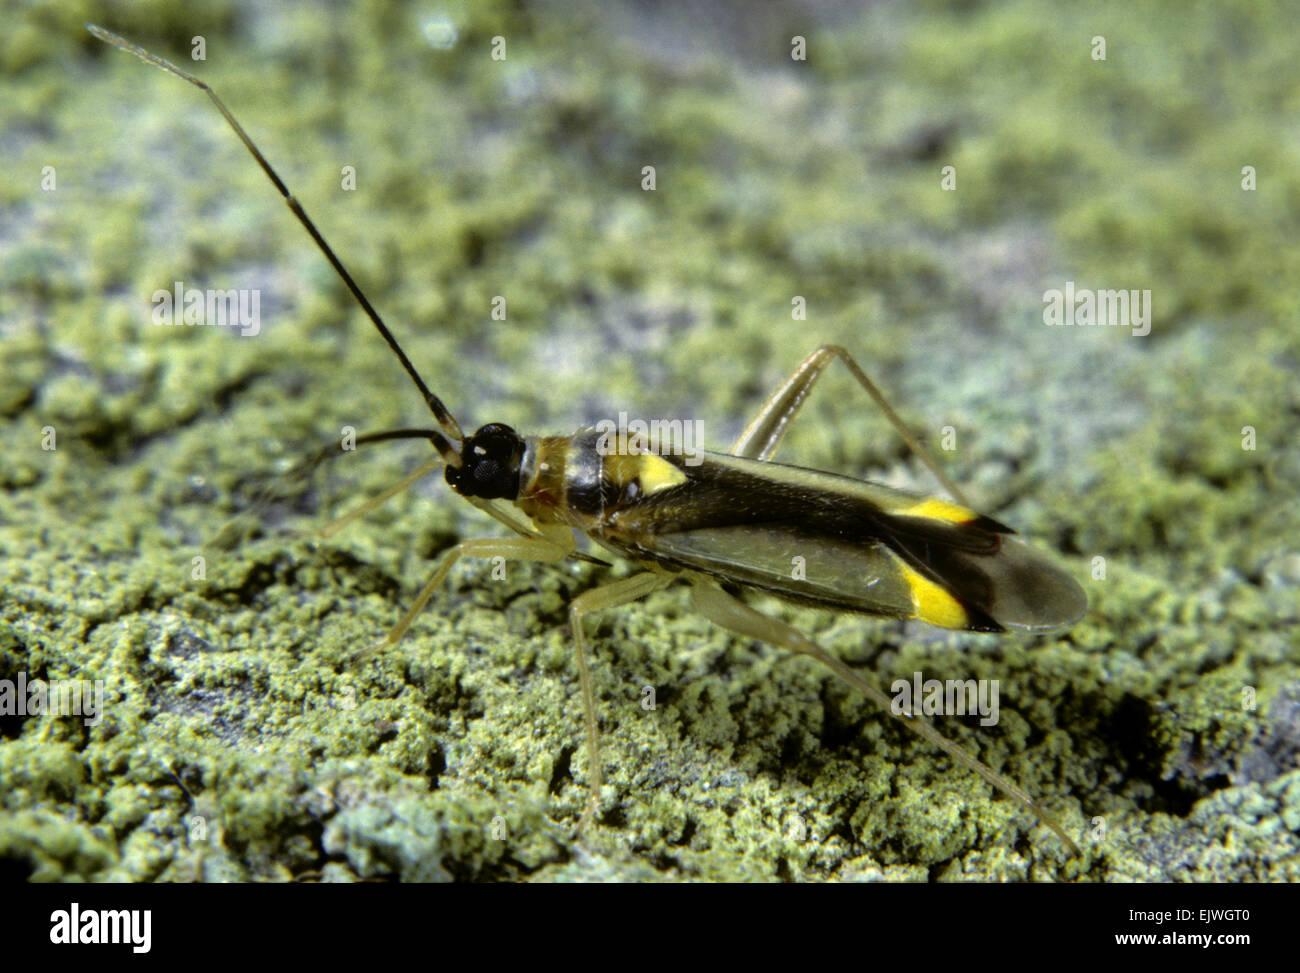 Capsid Bug - Campyloneura virgula - Stock Image